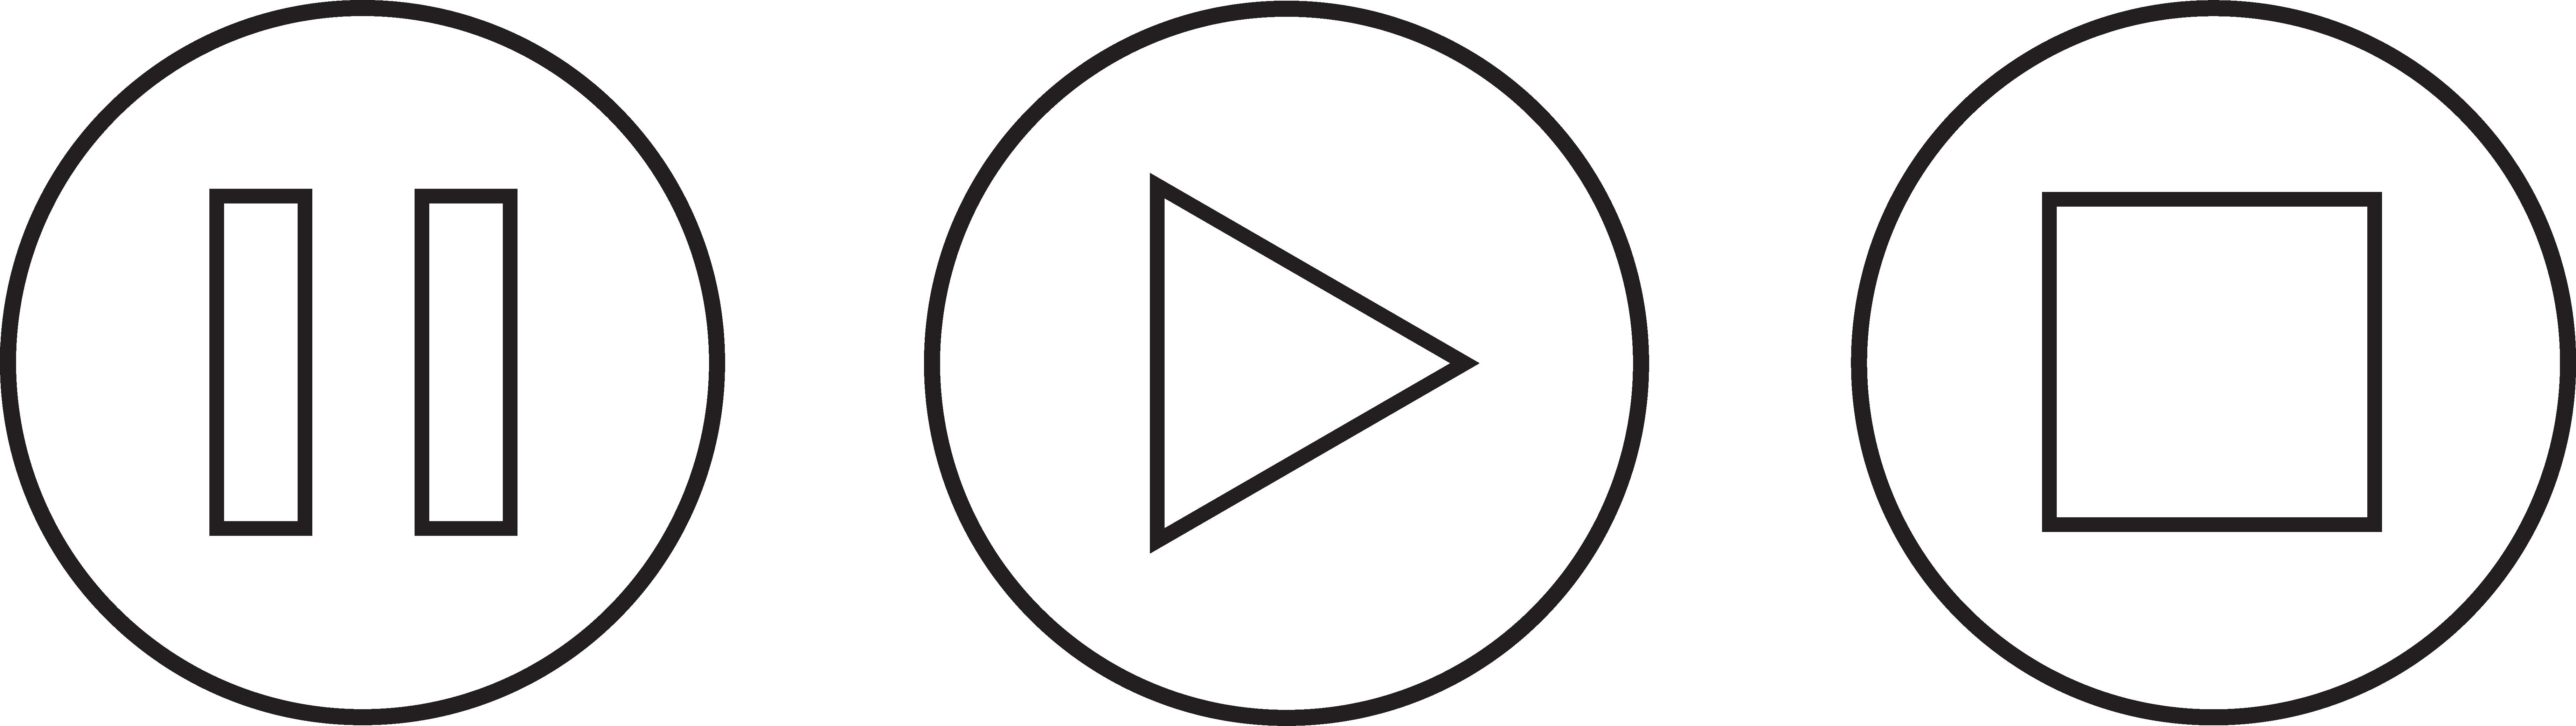 Play Pause Button Clipart #1-Play Pause Button Clipart #1-16